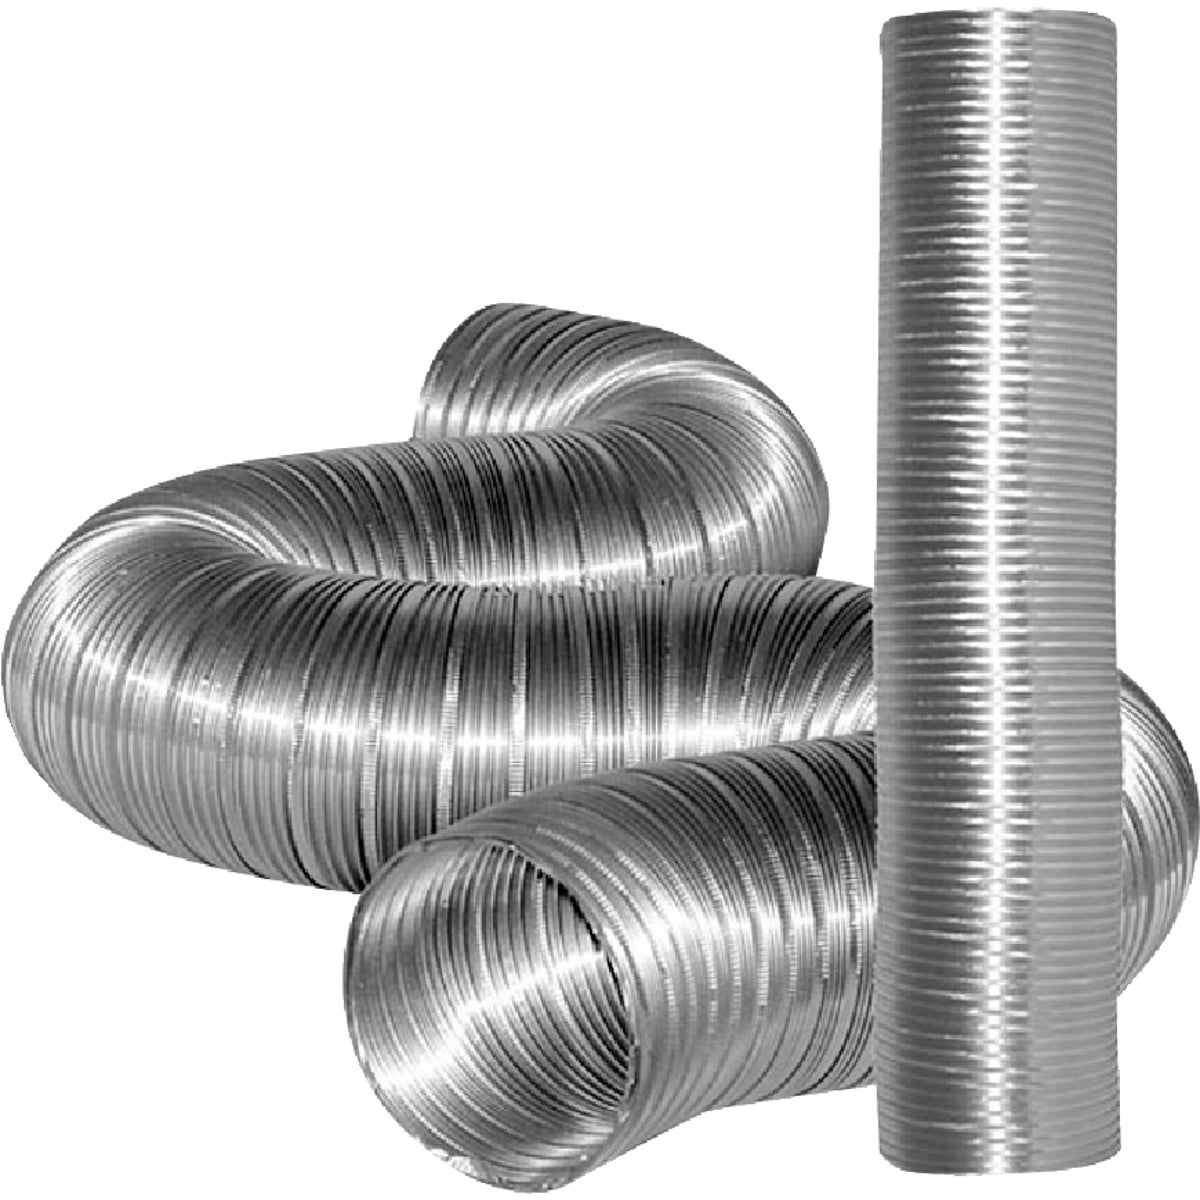 Dundas Jafine MFX58X Aluminum Duct-5X8 ALUM FLEXIBLE DUCT